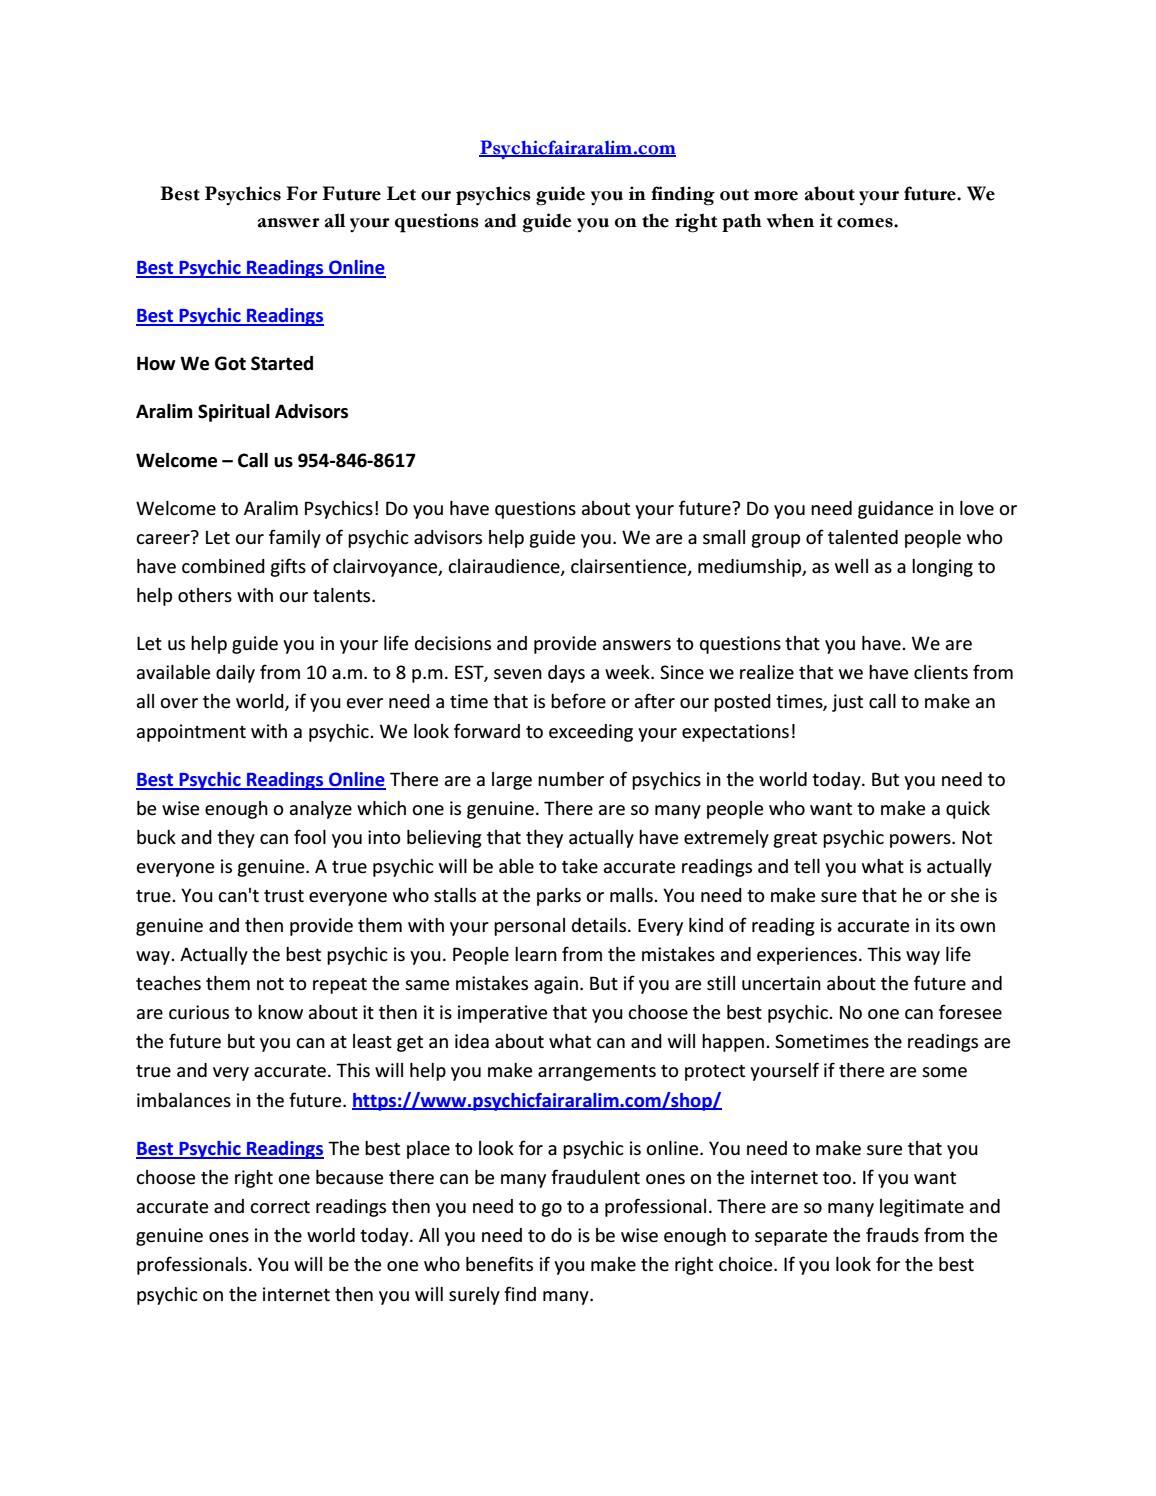 Best psychic readings by Insaf Solanki - issuu